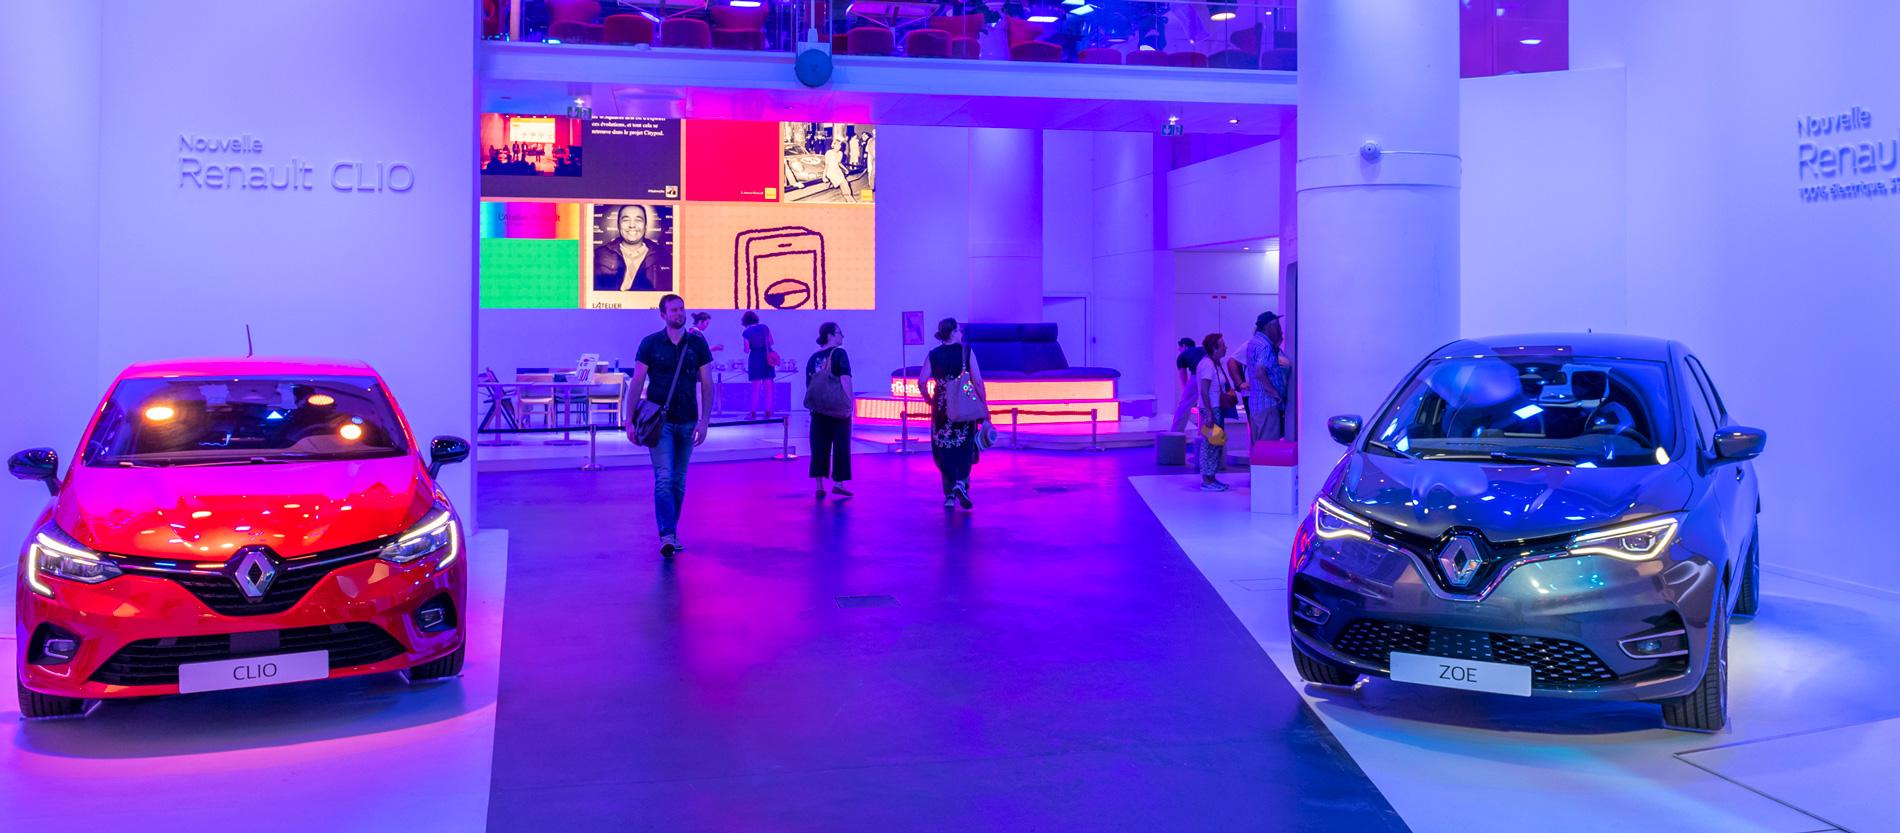 Case study Groupe Renault par tequilarapido